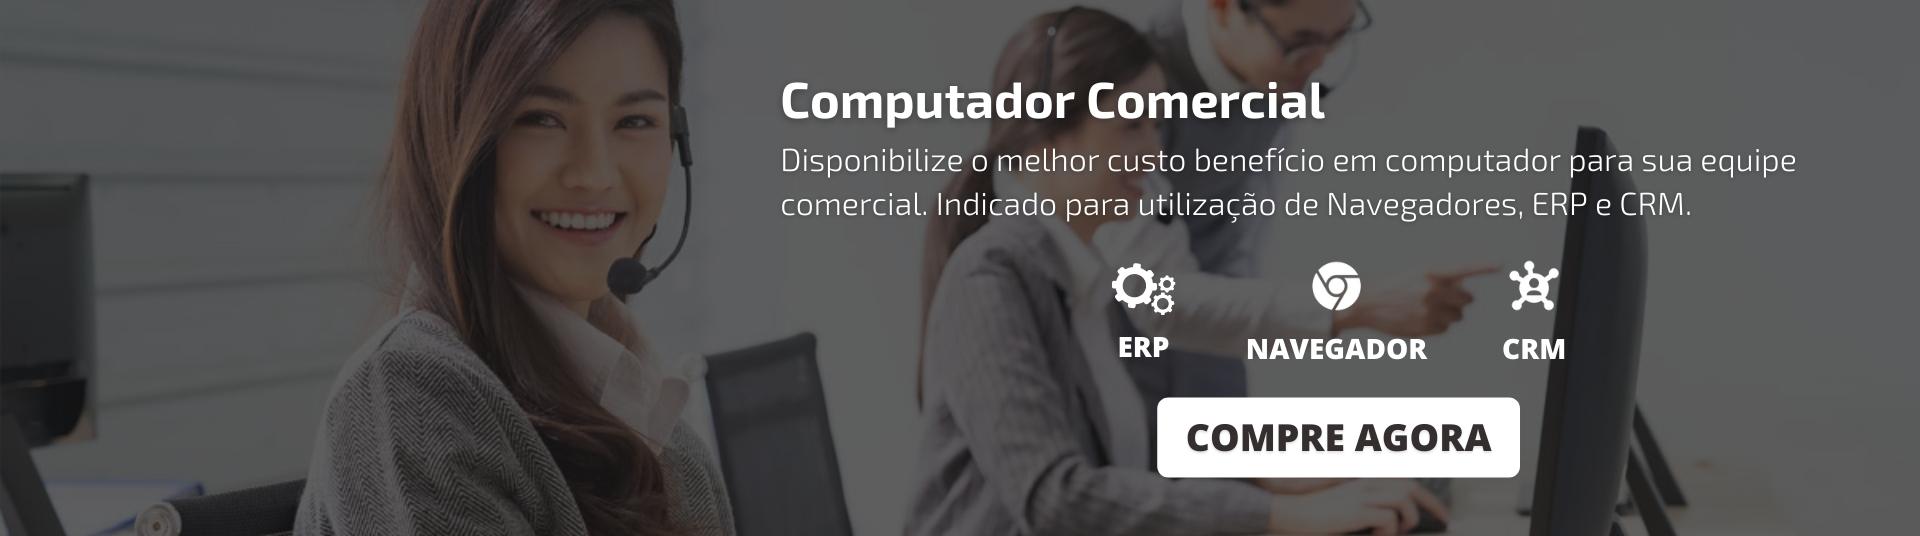 Computador Comercial